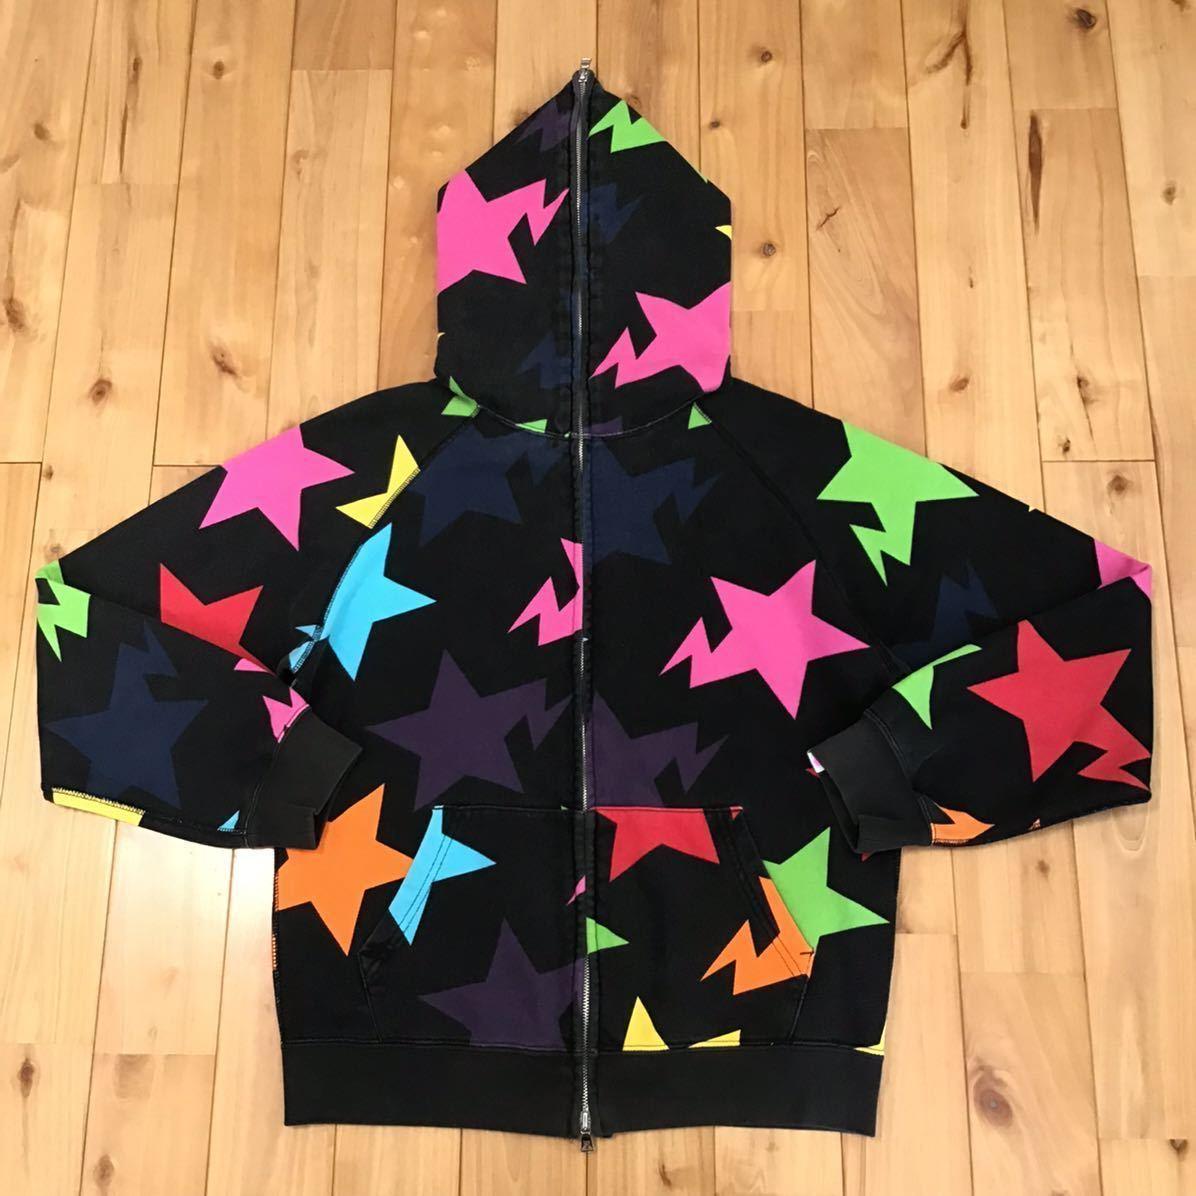 APEE スター パーカー レディース TALLサイズ a bathing ape bape sta full zip hoodie エイプ ベイプ アベイシングエイプ star ladies 32